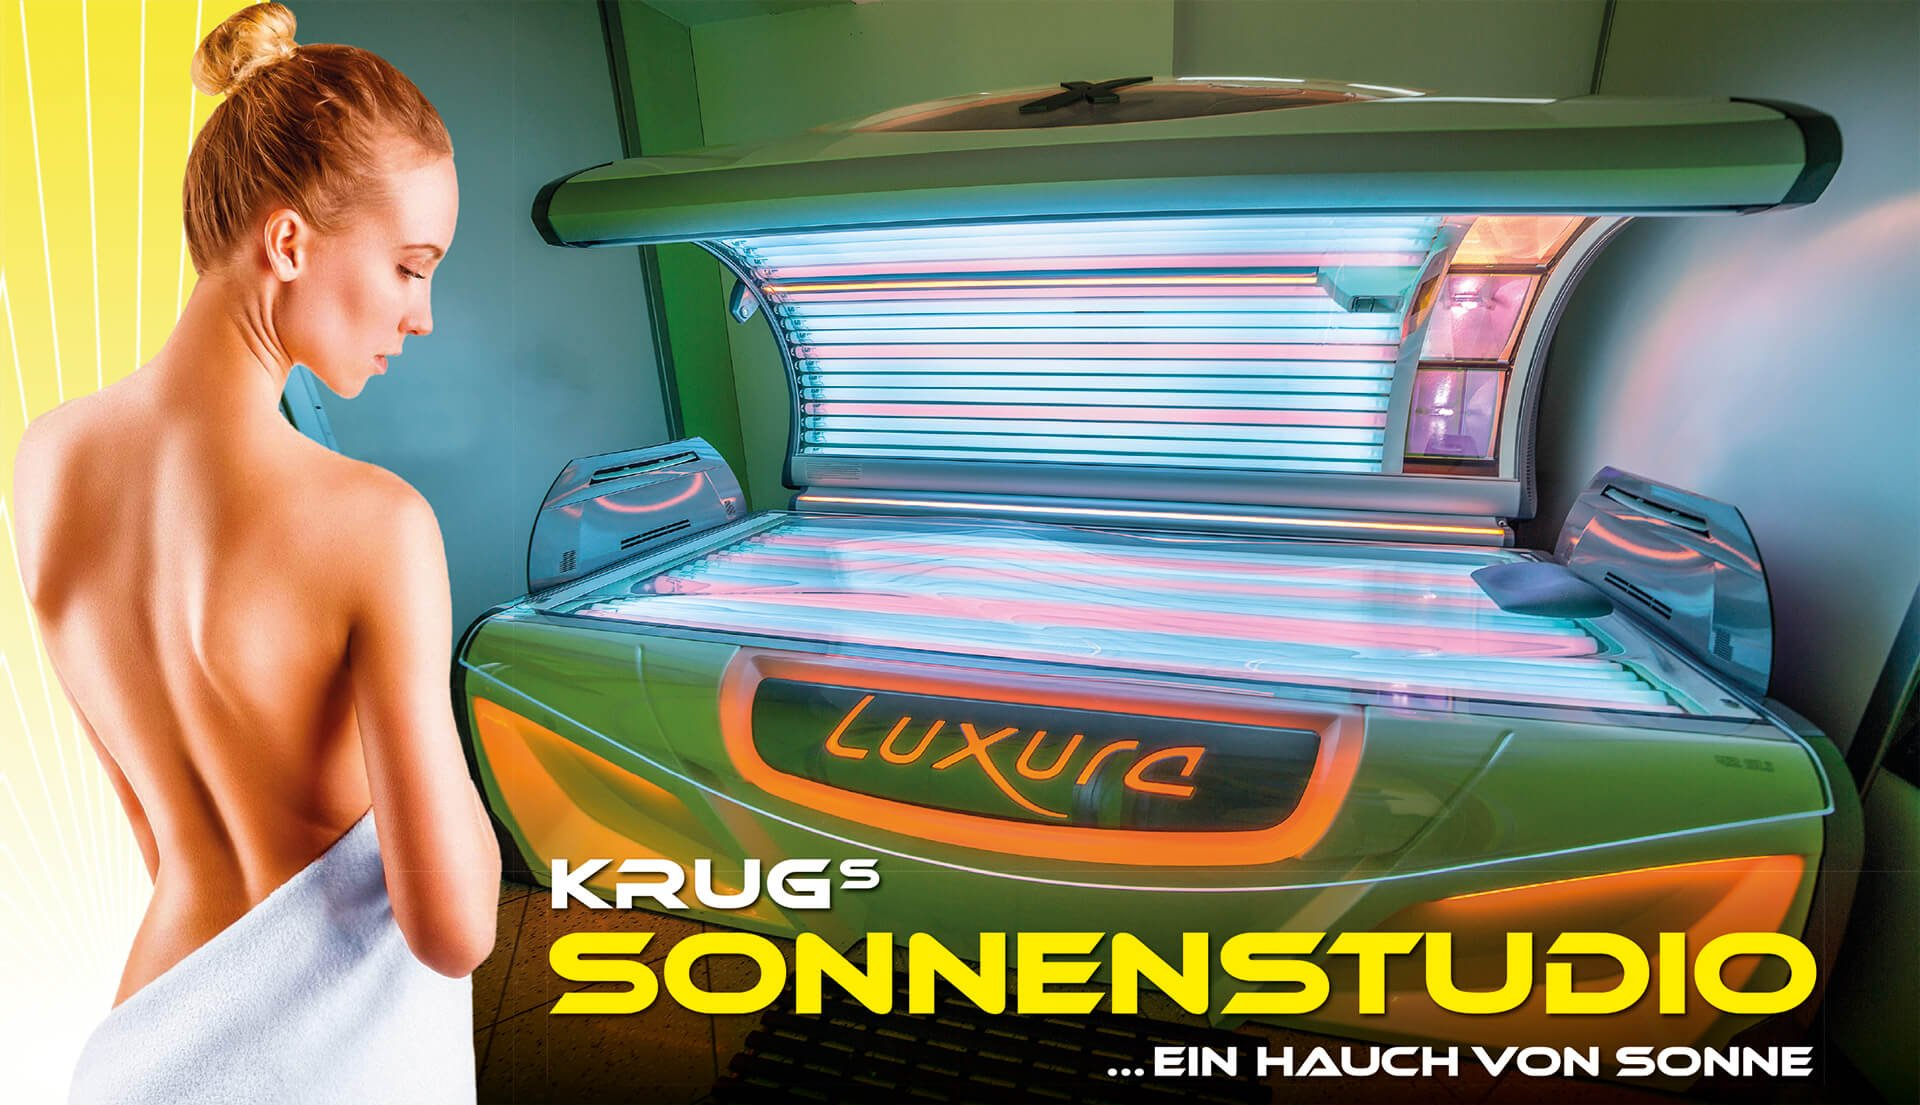 Luxura-Krugs-Sonnenstudio